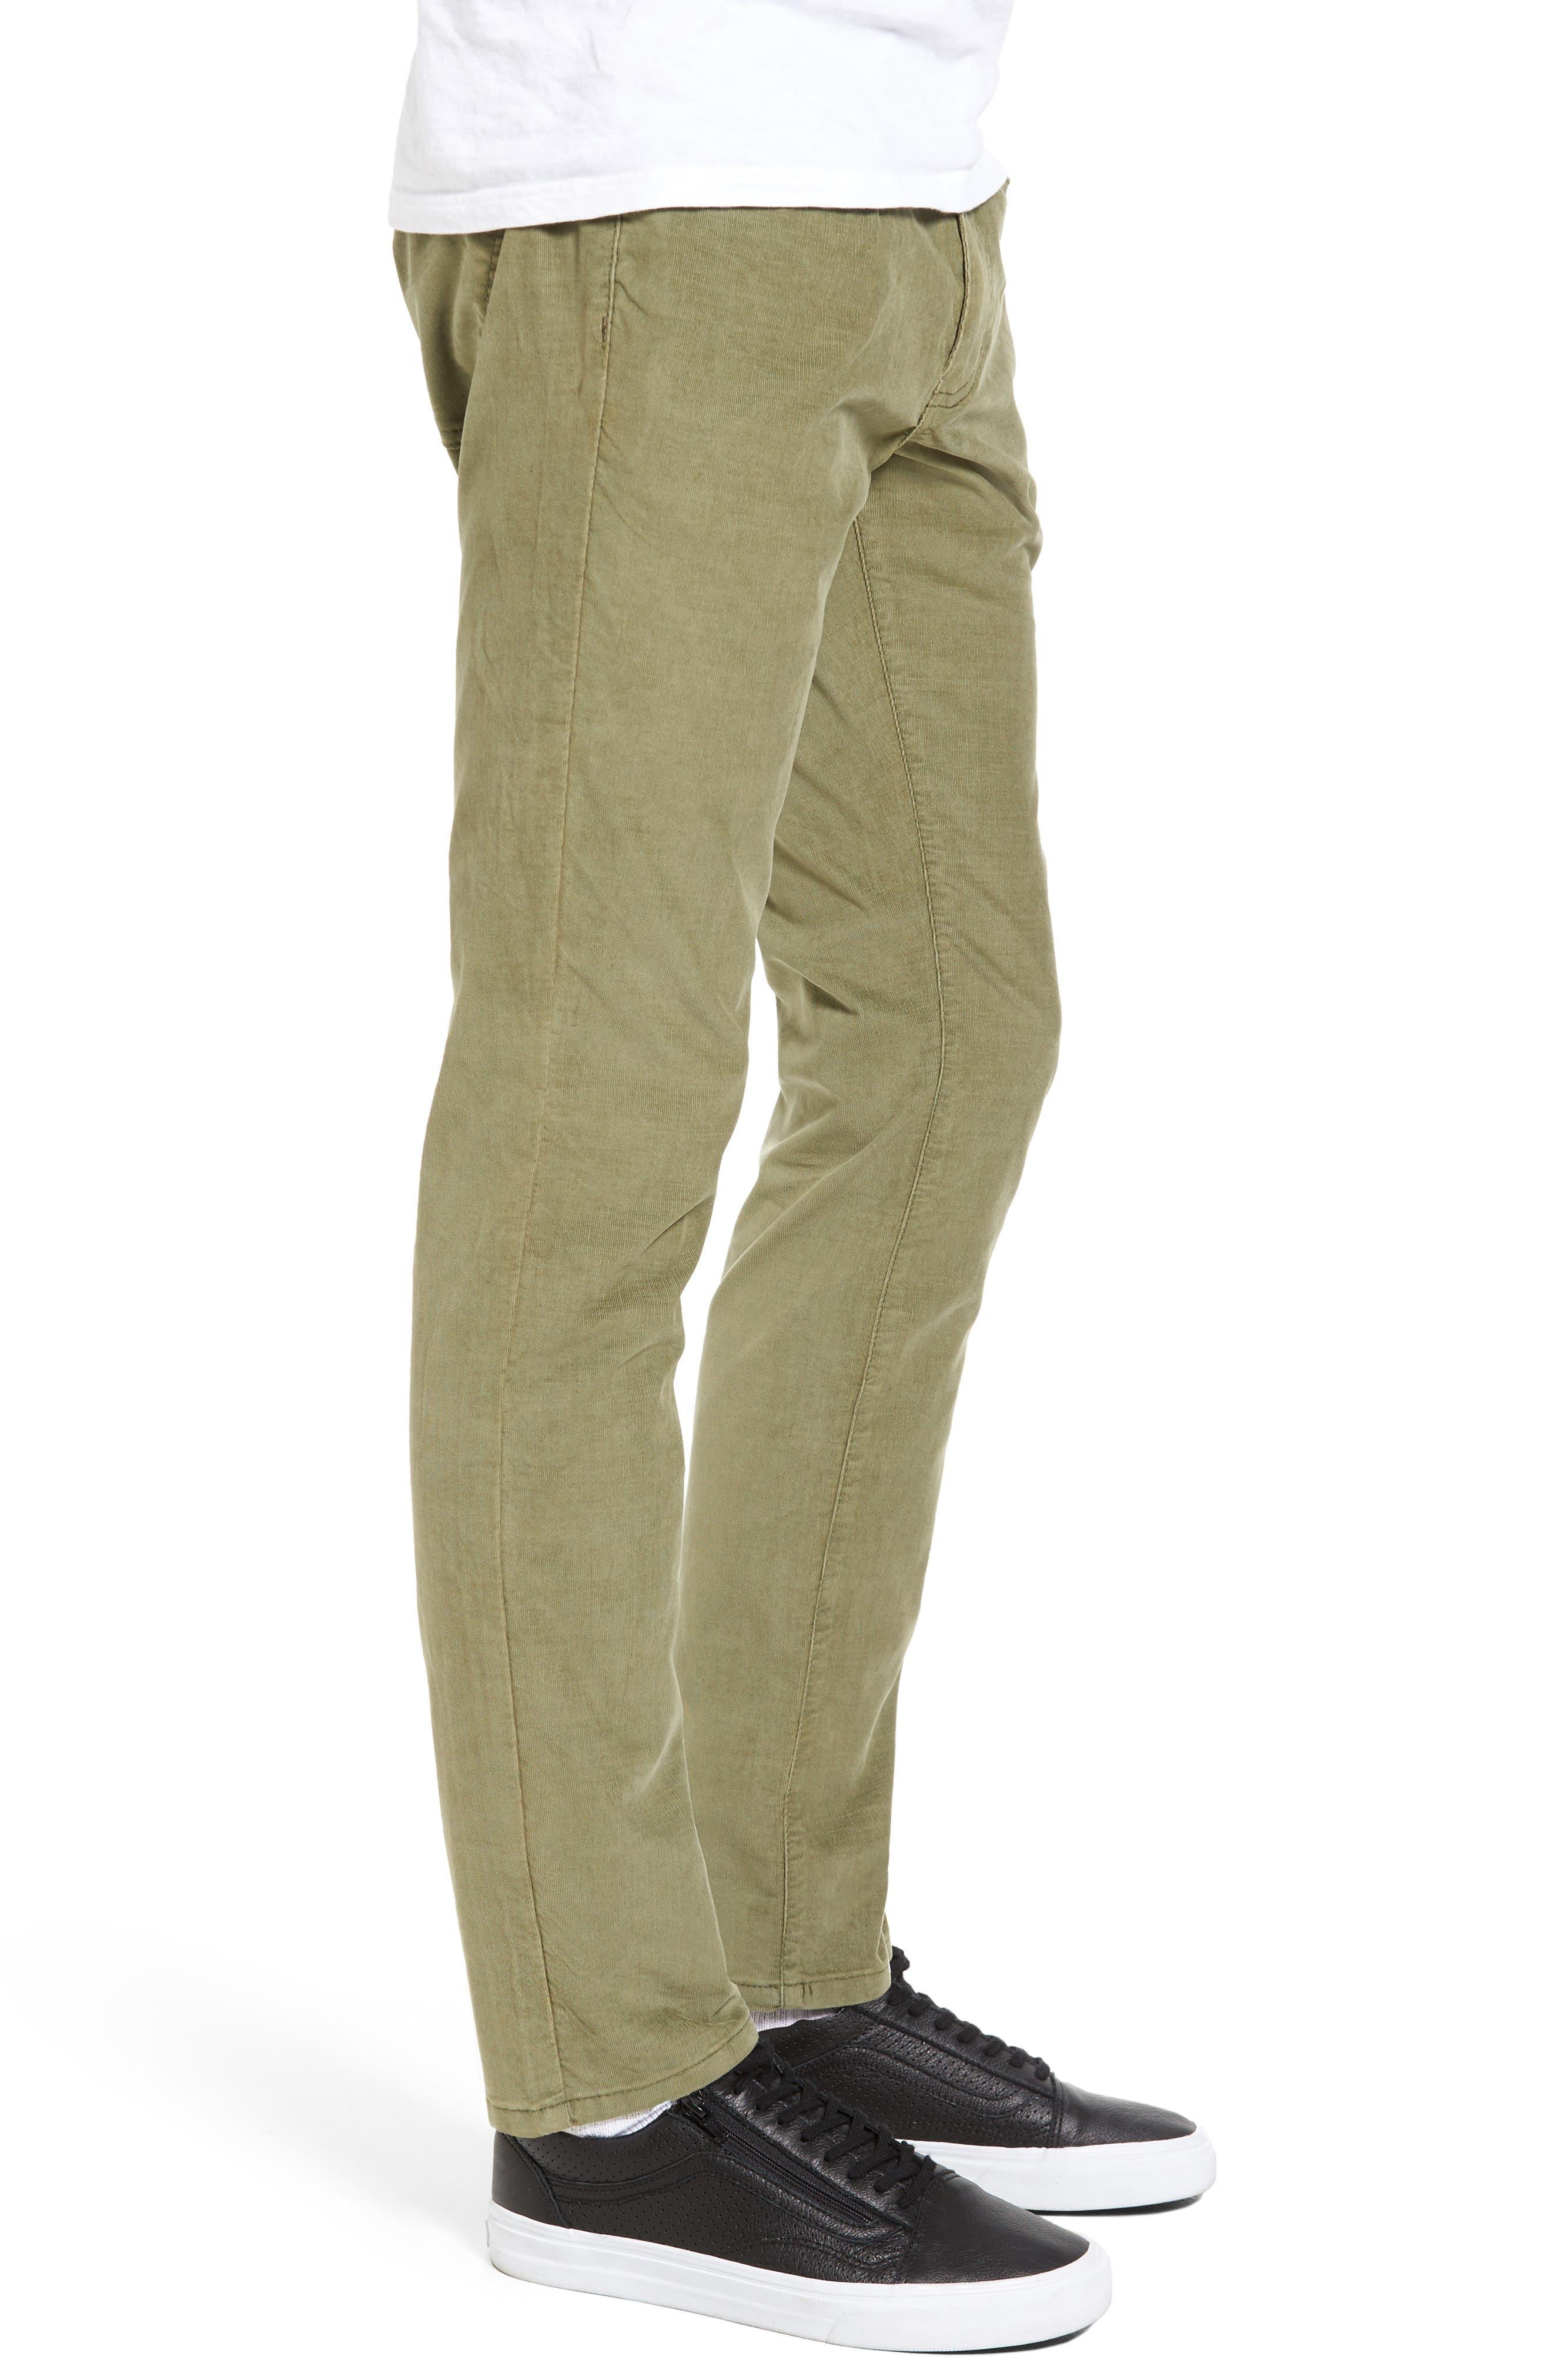 Bryce Chopper Slim Fit Corduroy Pants,                             Alternate thumbnail 4, color,                             302